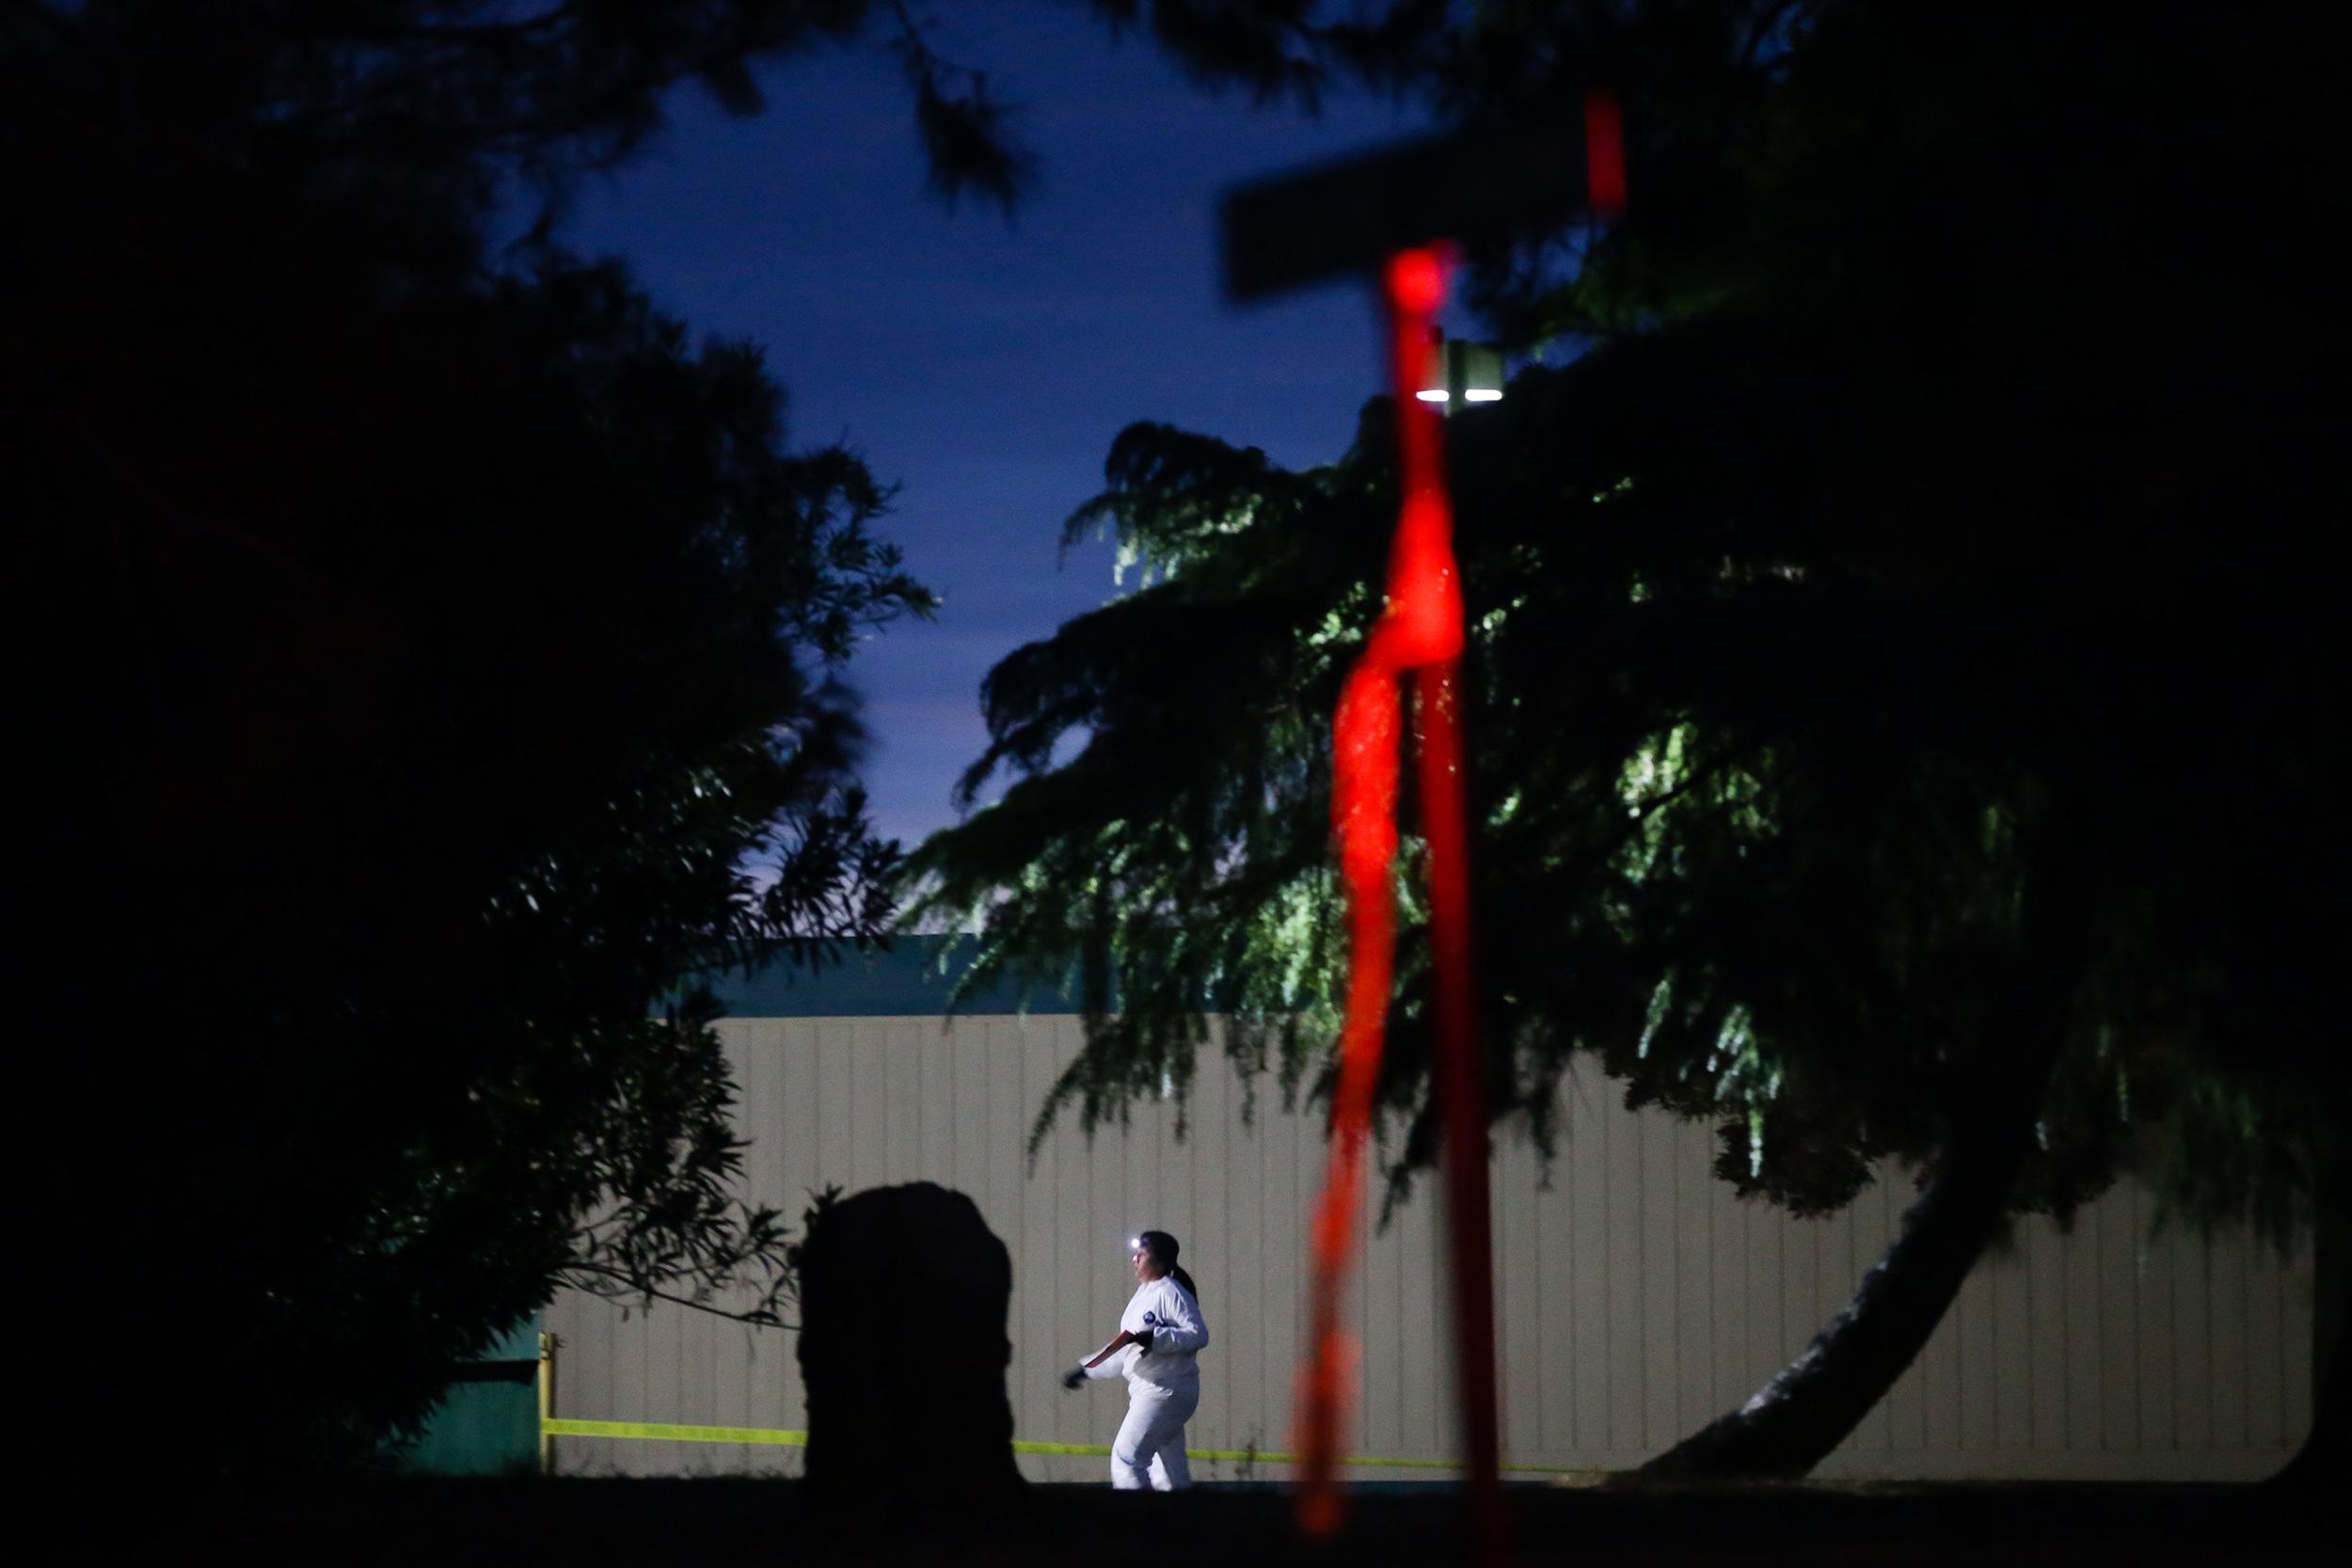 Image: Rancho Tehama Shooting